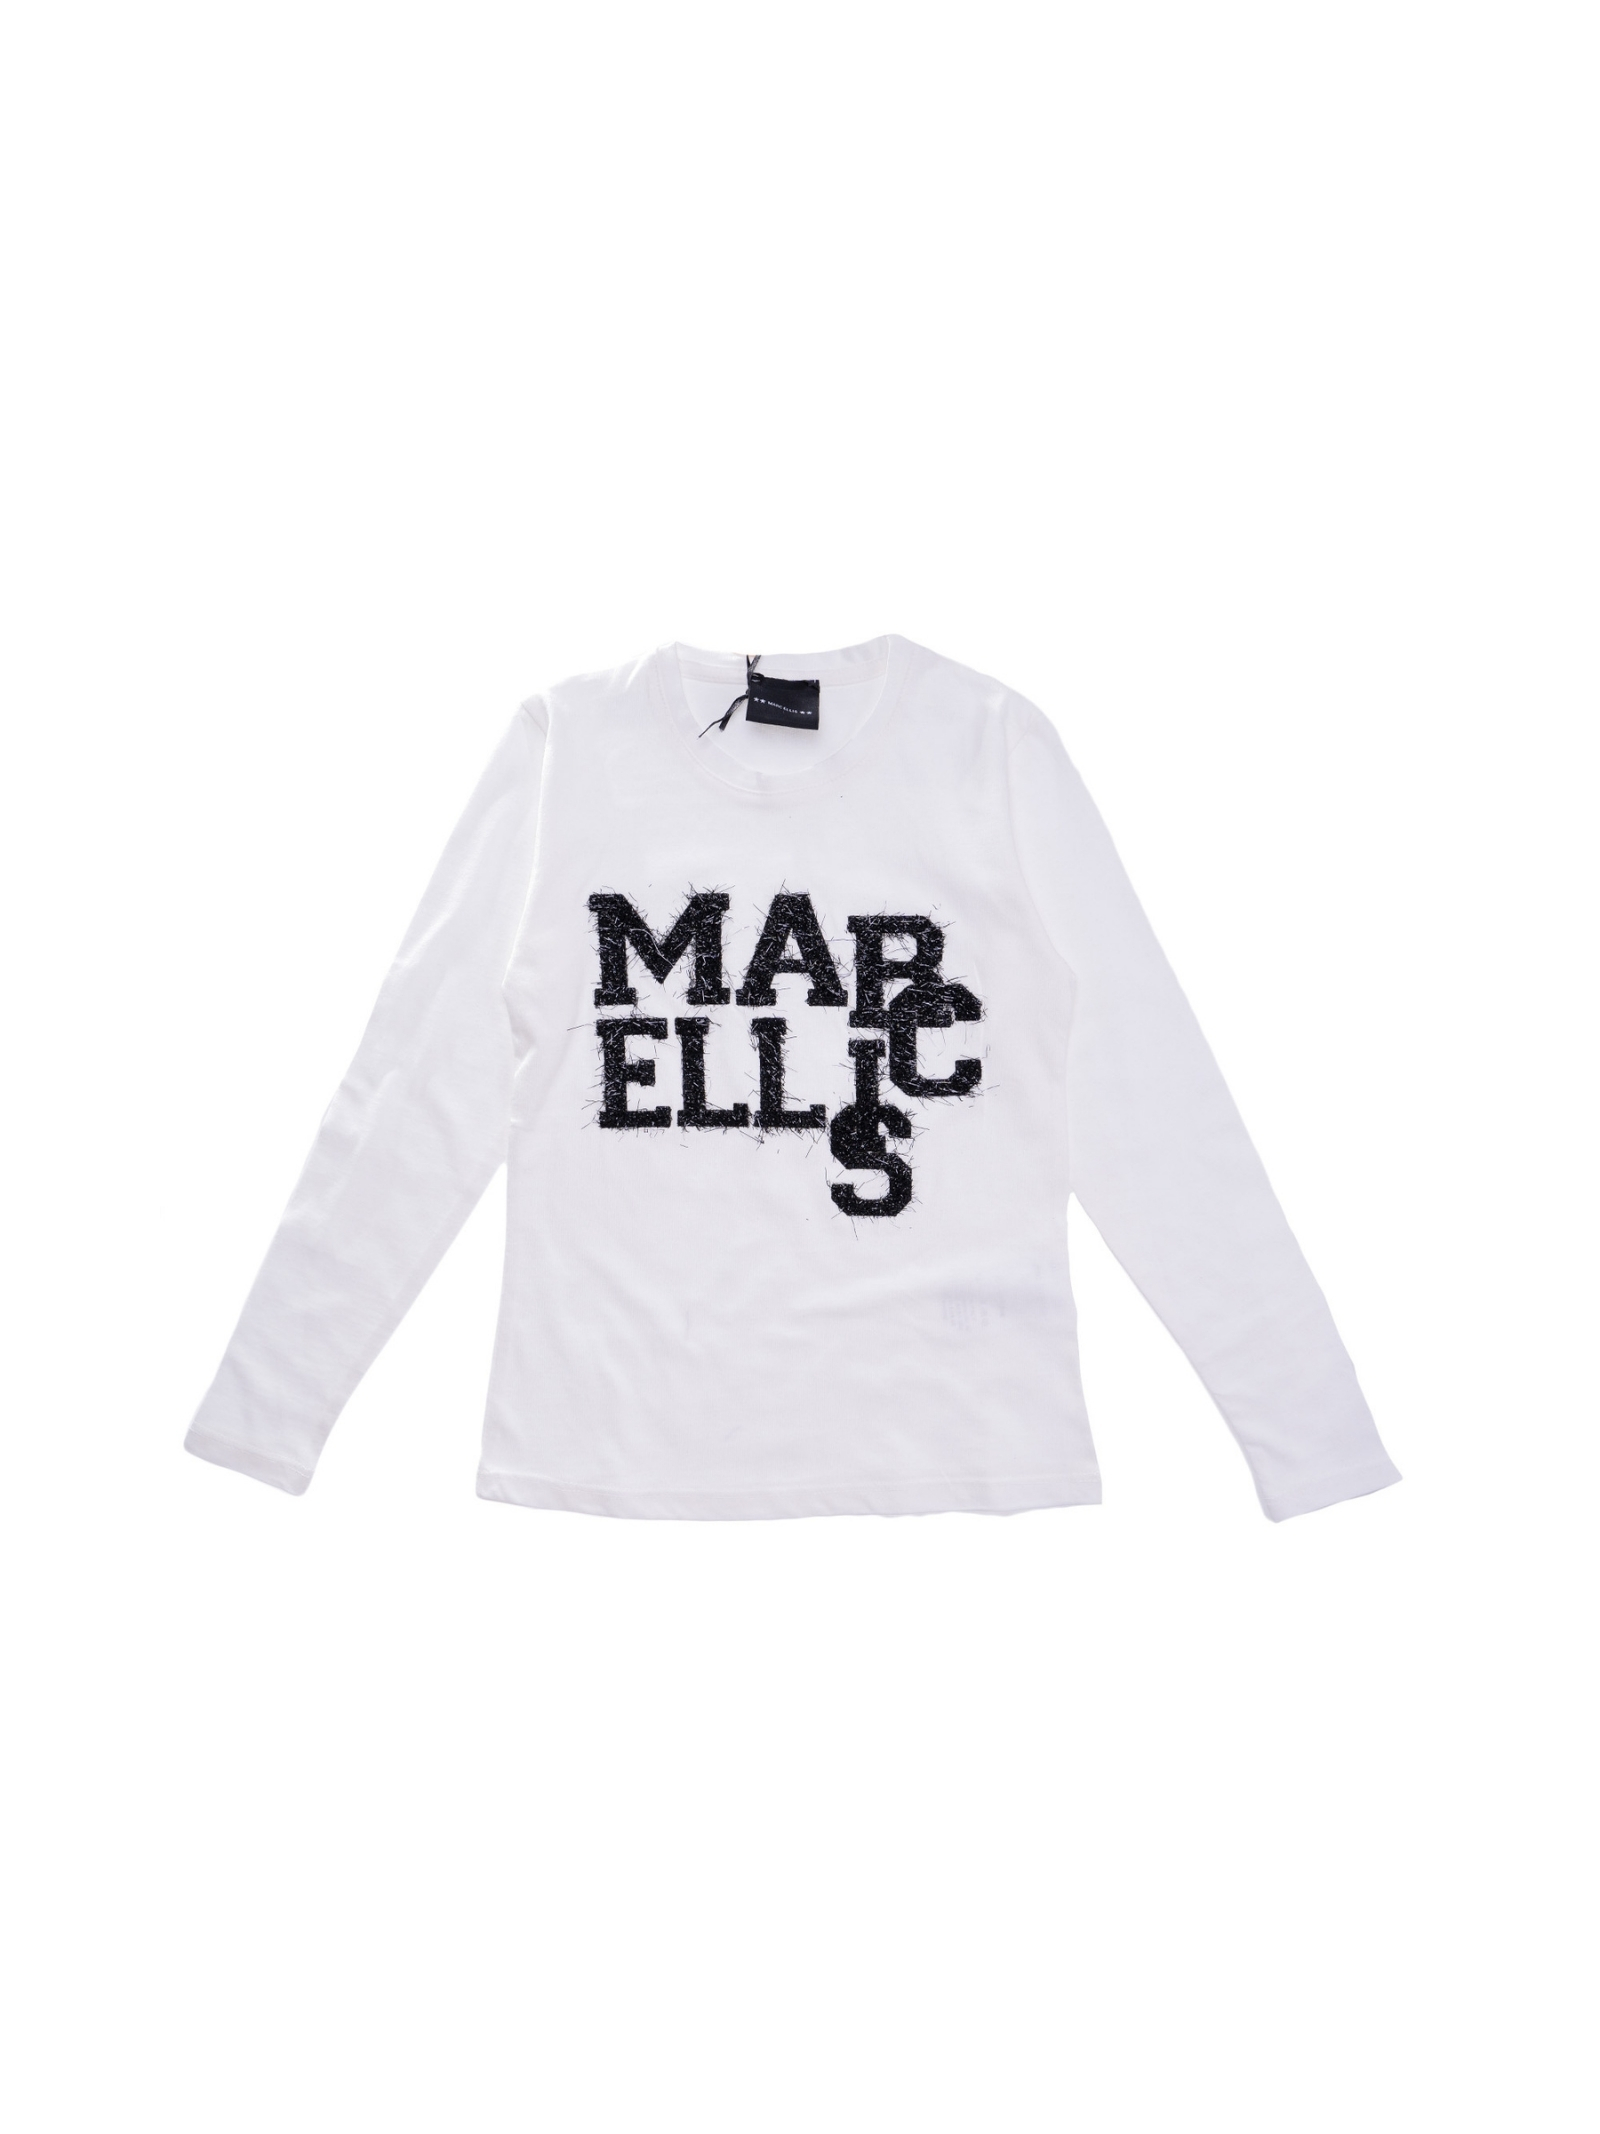 Glamor Girl Sweater MARC ELLIS NEW YORK KIDS |  | JMEJTS6090BIANCO